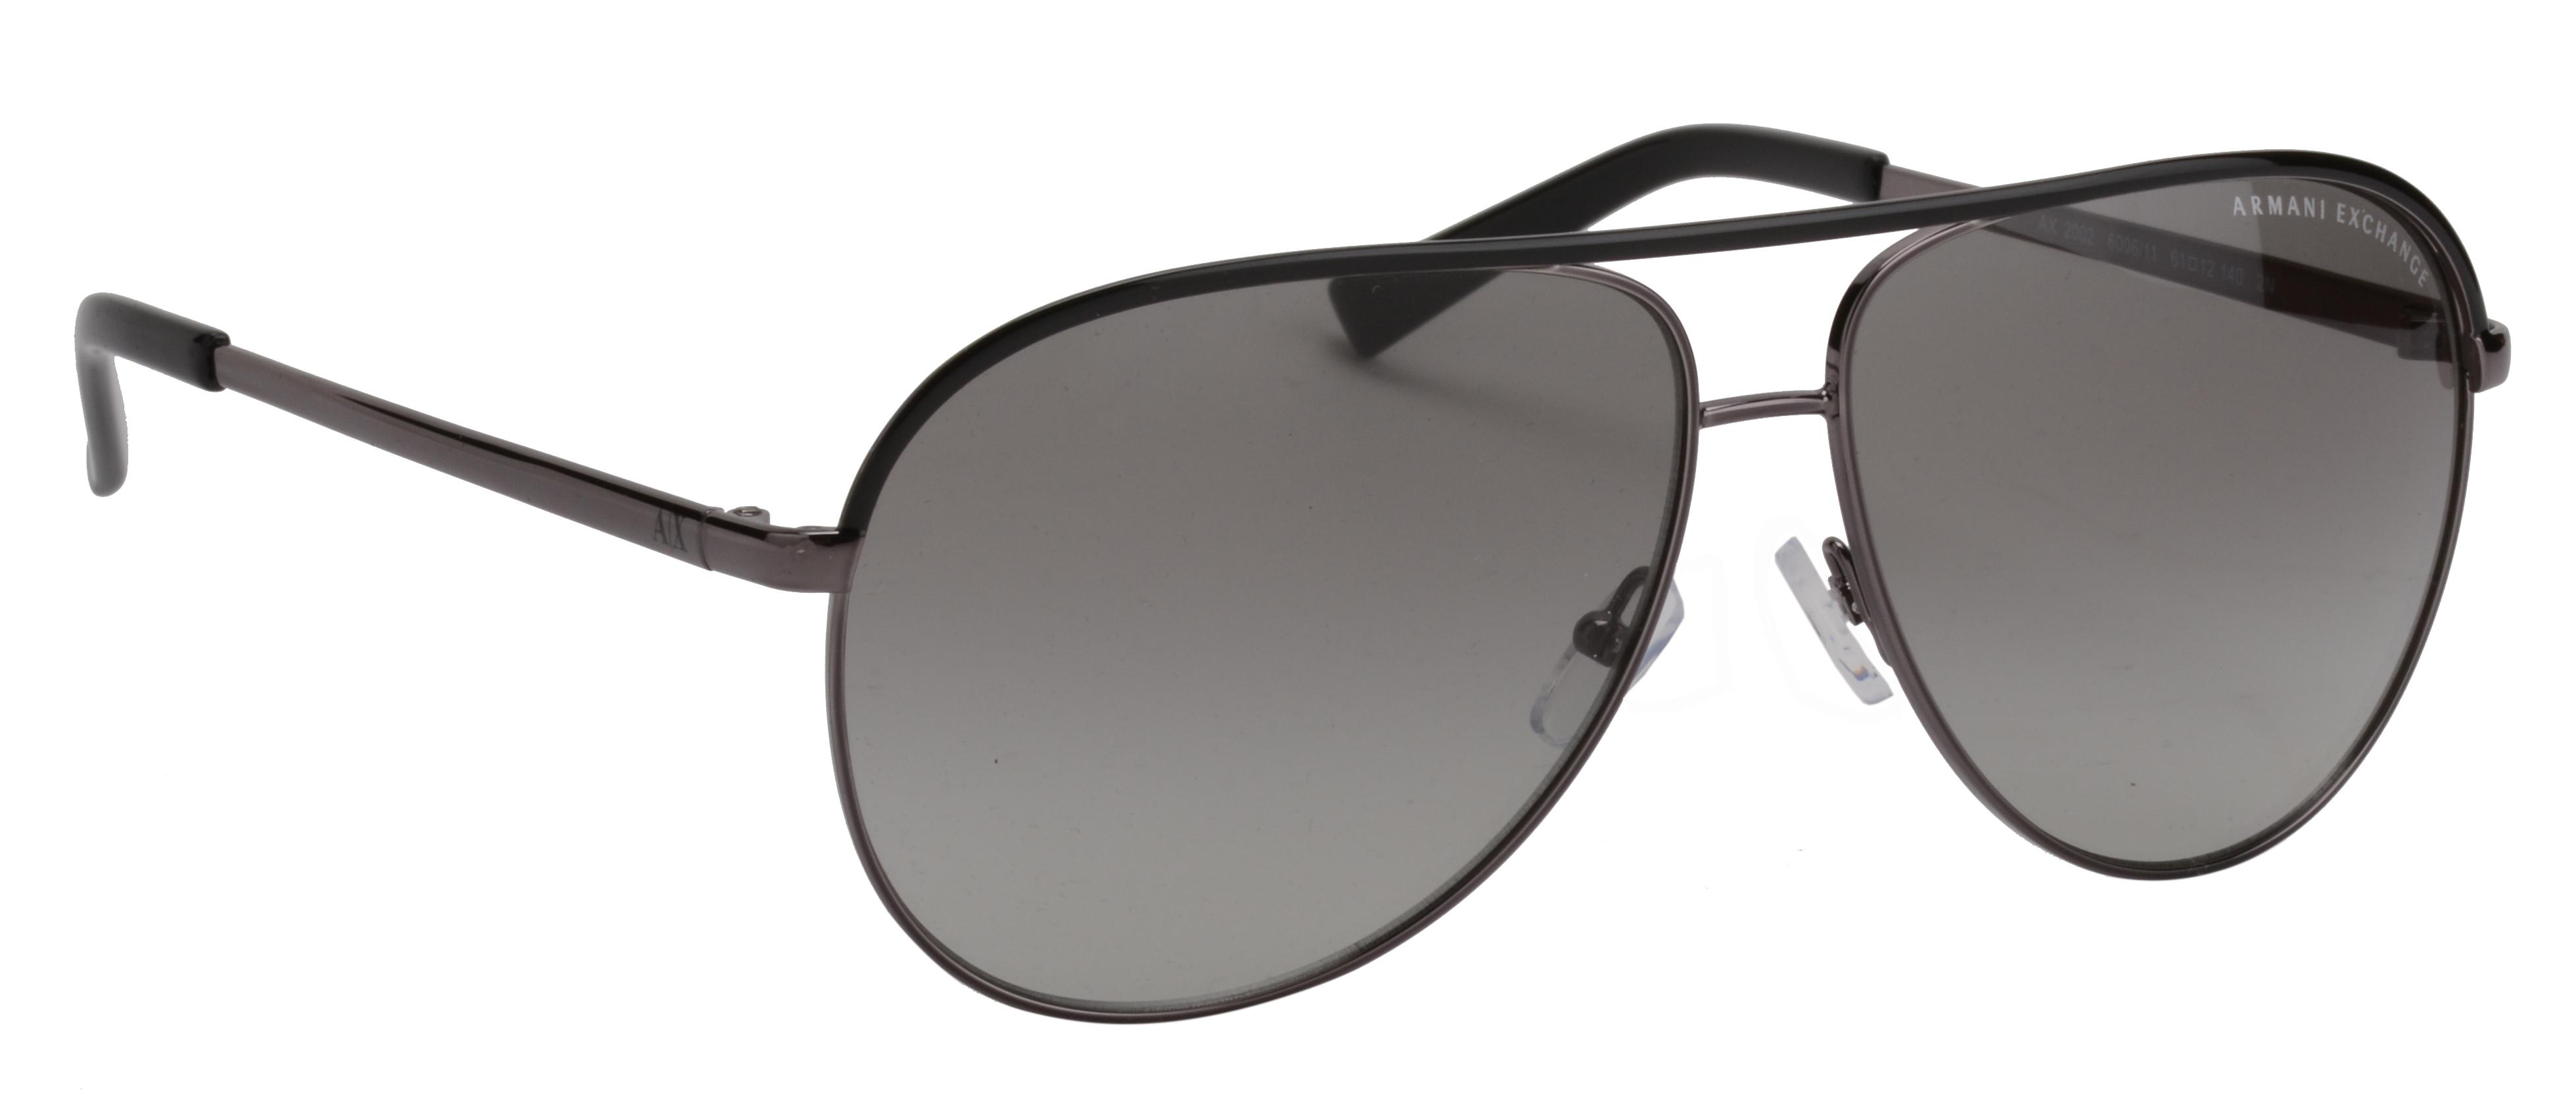 78d2bdc1429 Armani Exchange Sunglasses Ebay « Heritage Malta